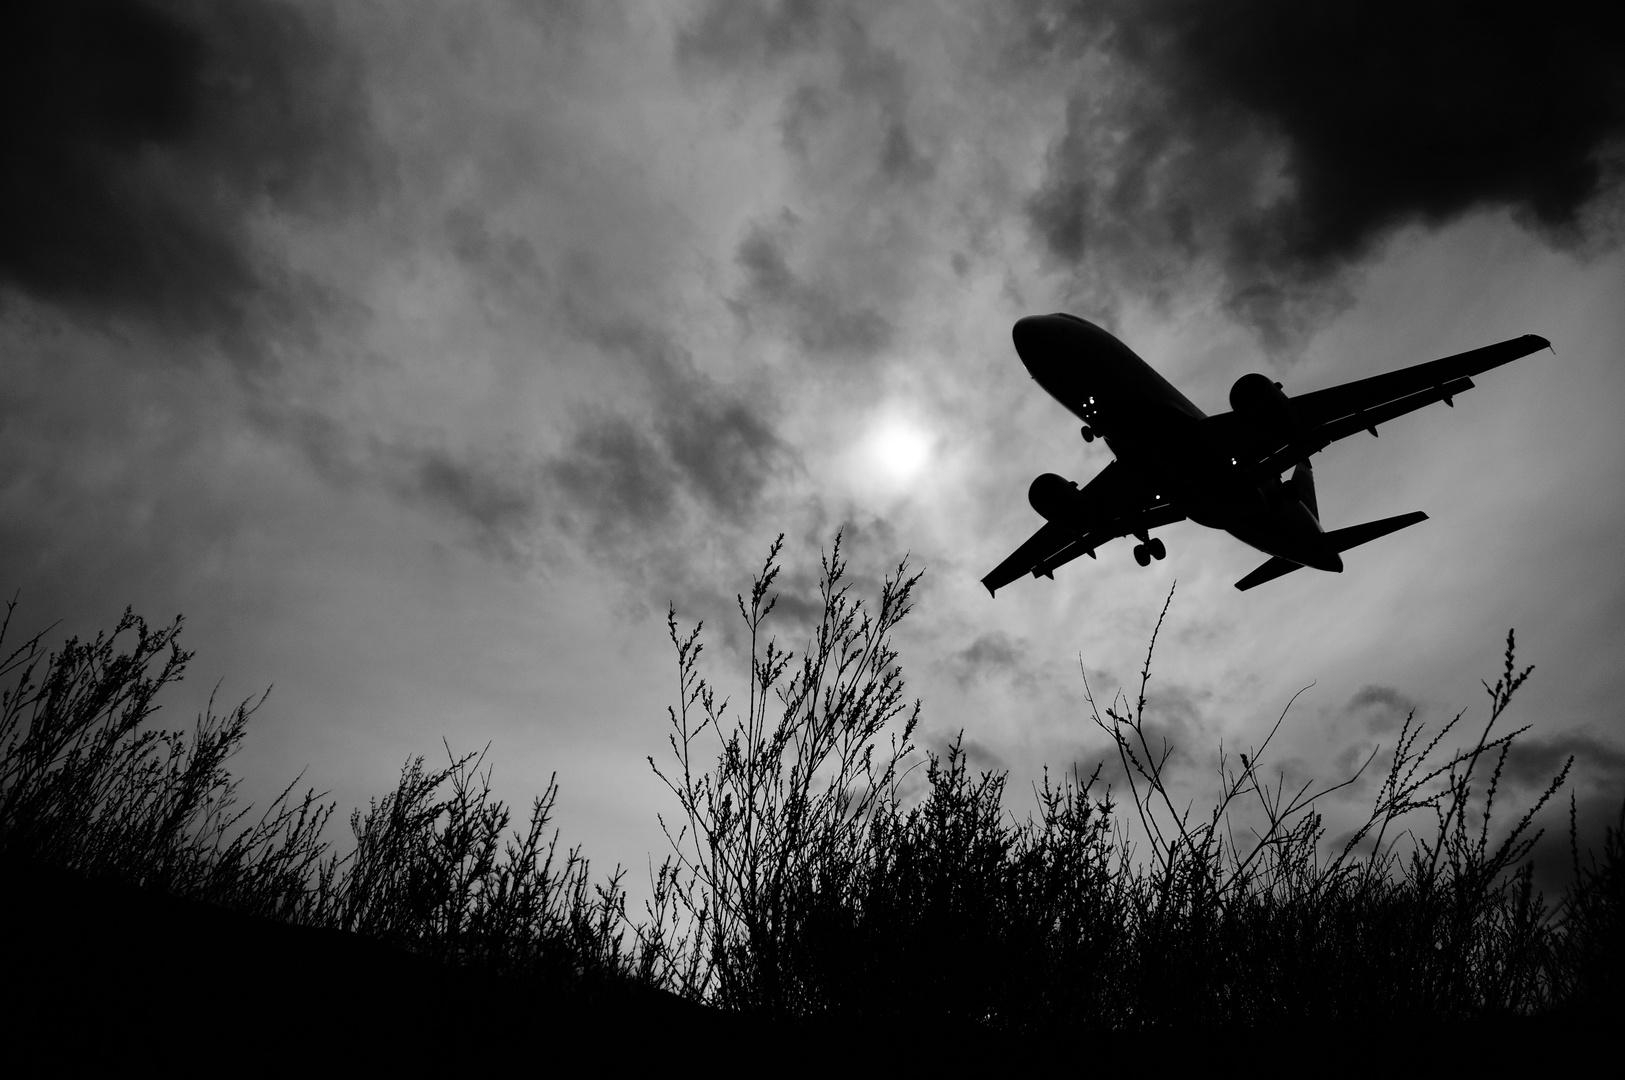 Landeanflug bei Föhnsturm in der Dämmerung